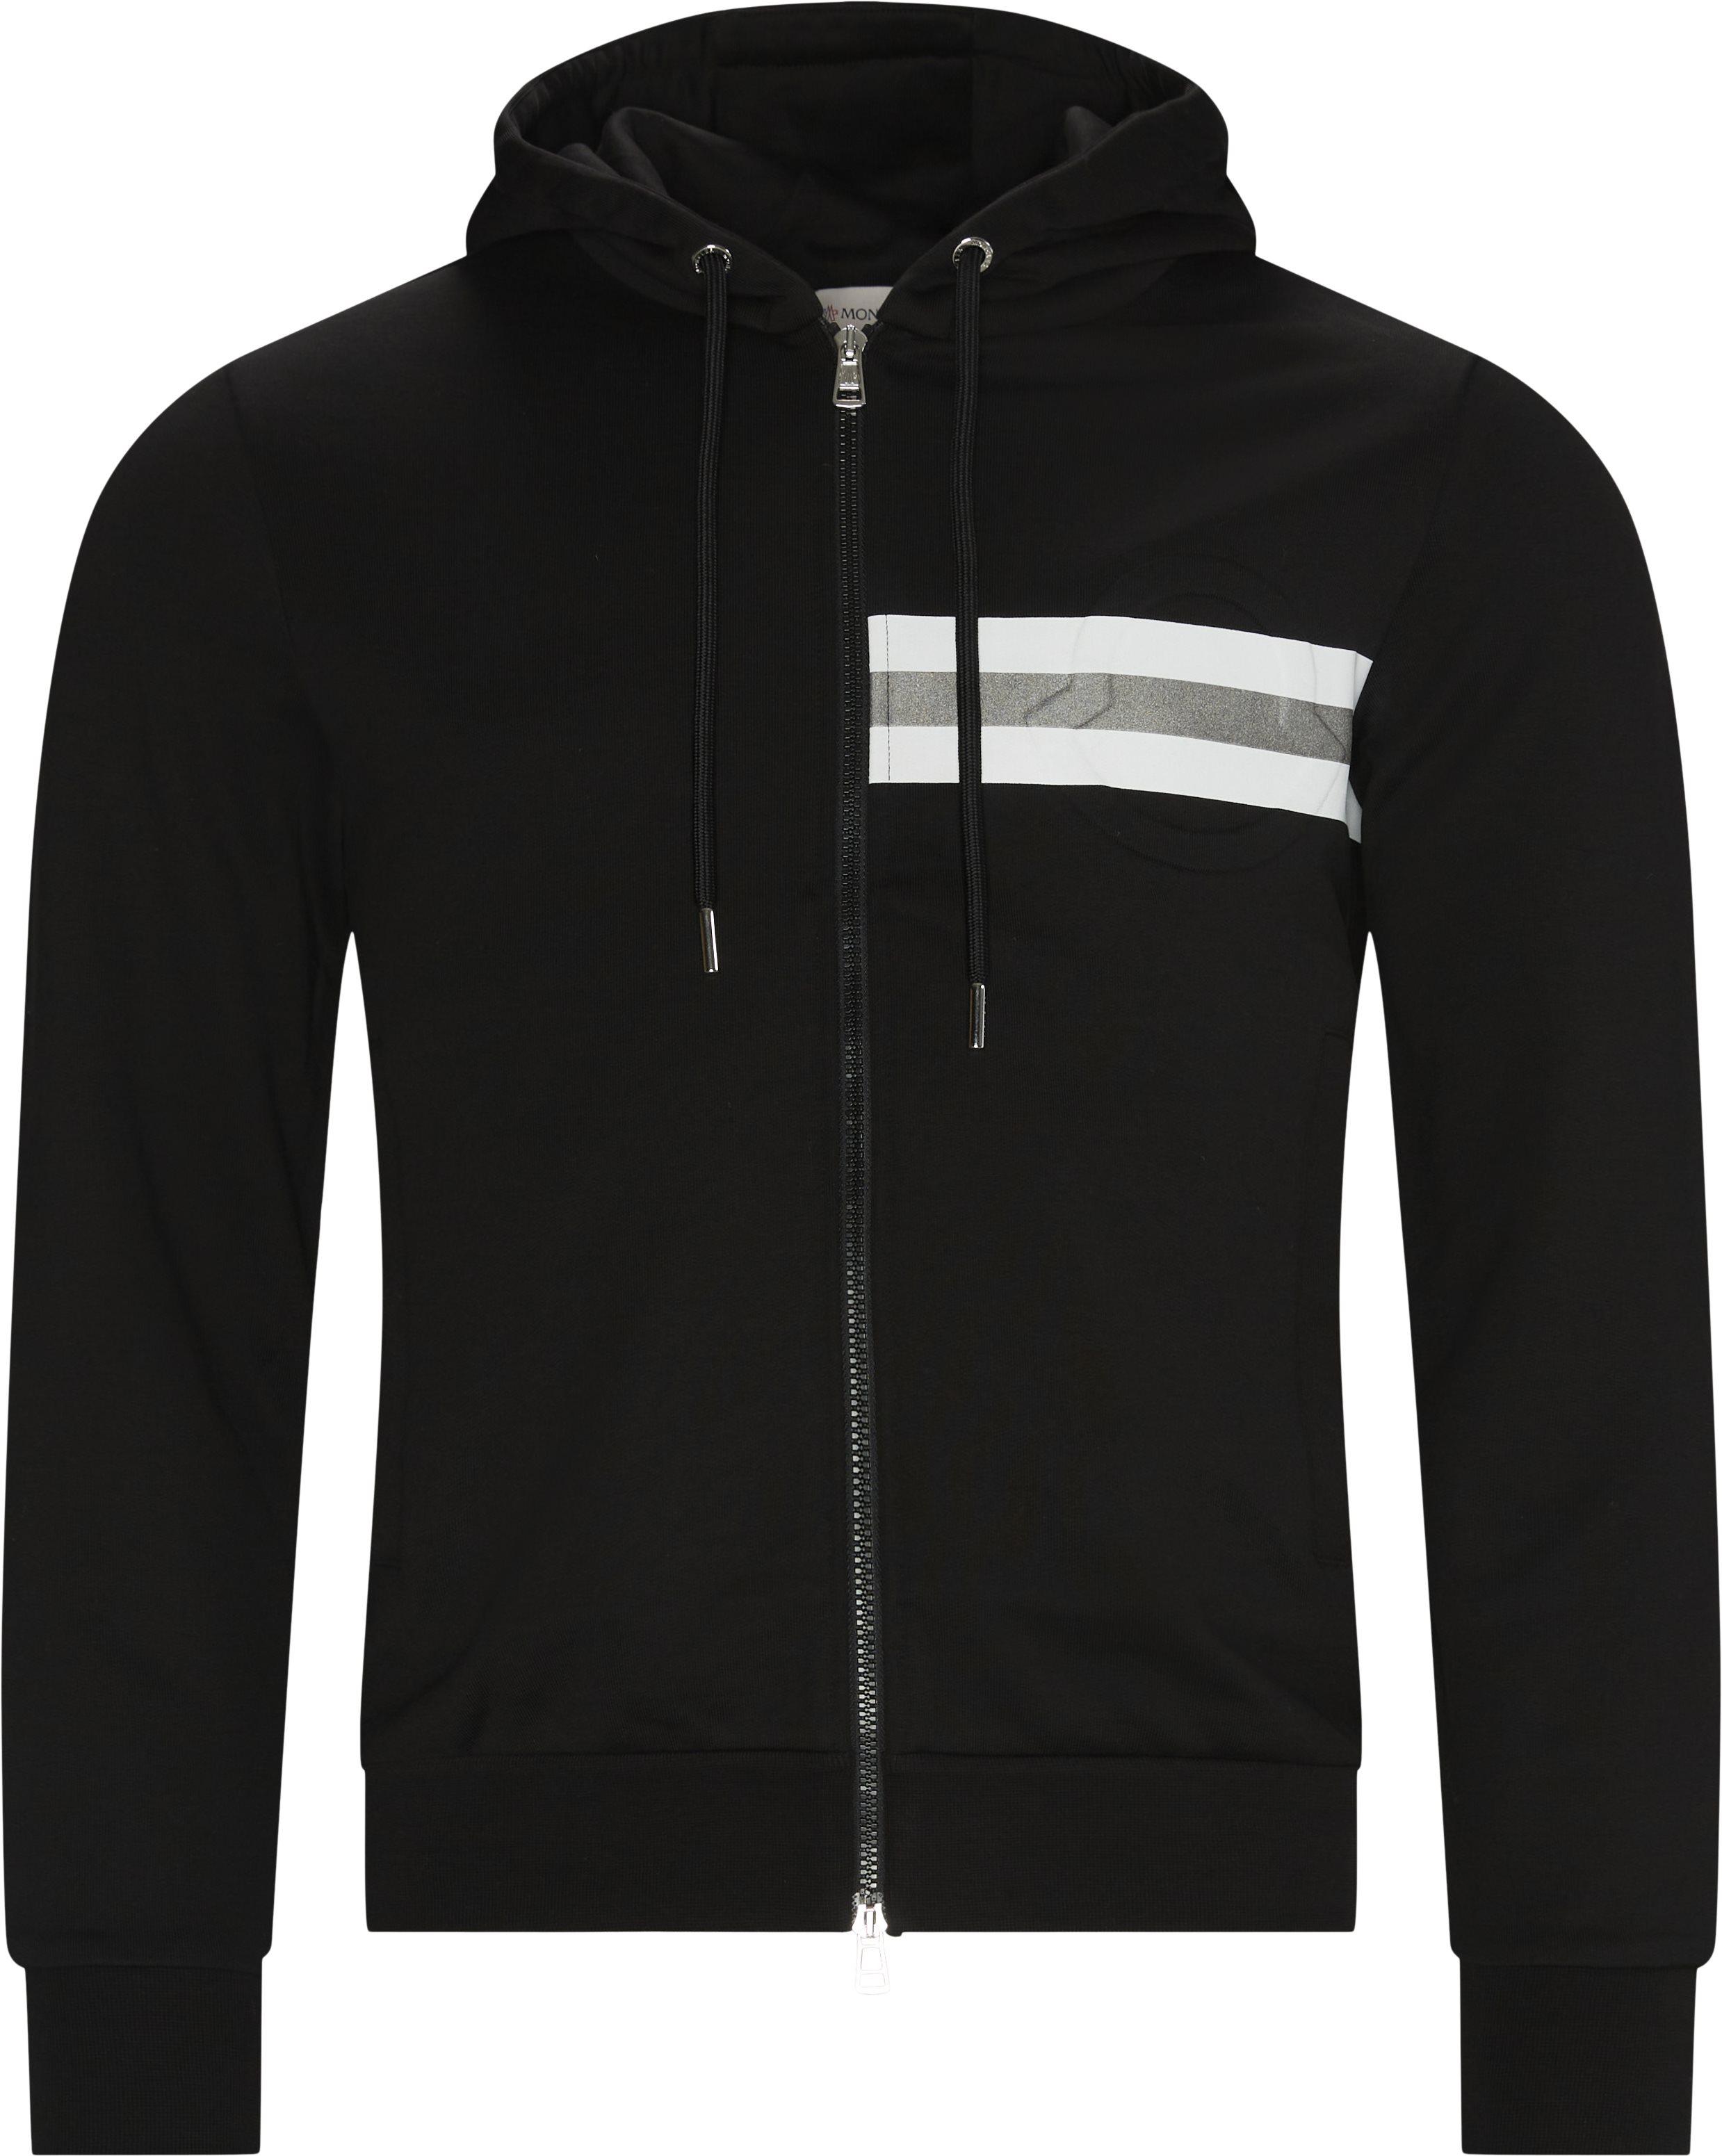 Sweatshirts - Regular fit - Sort